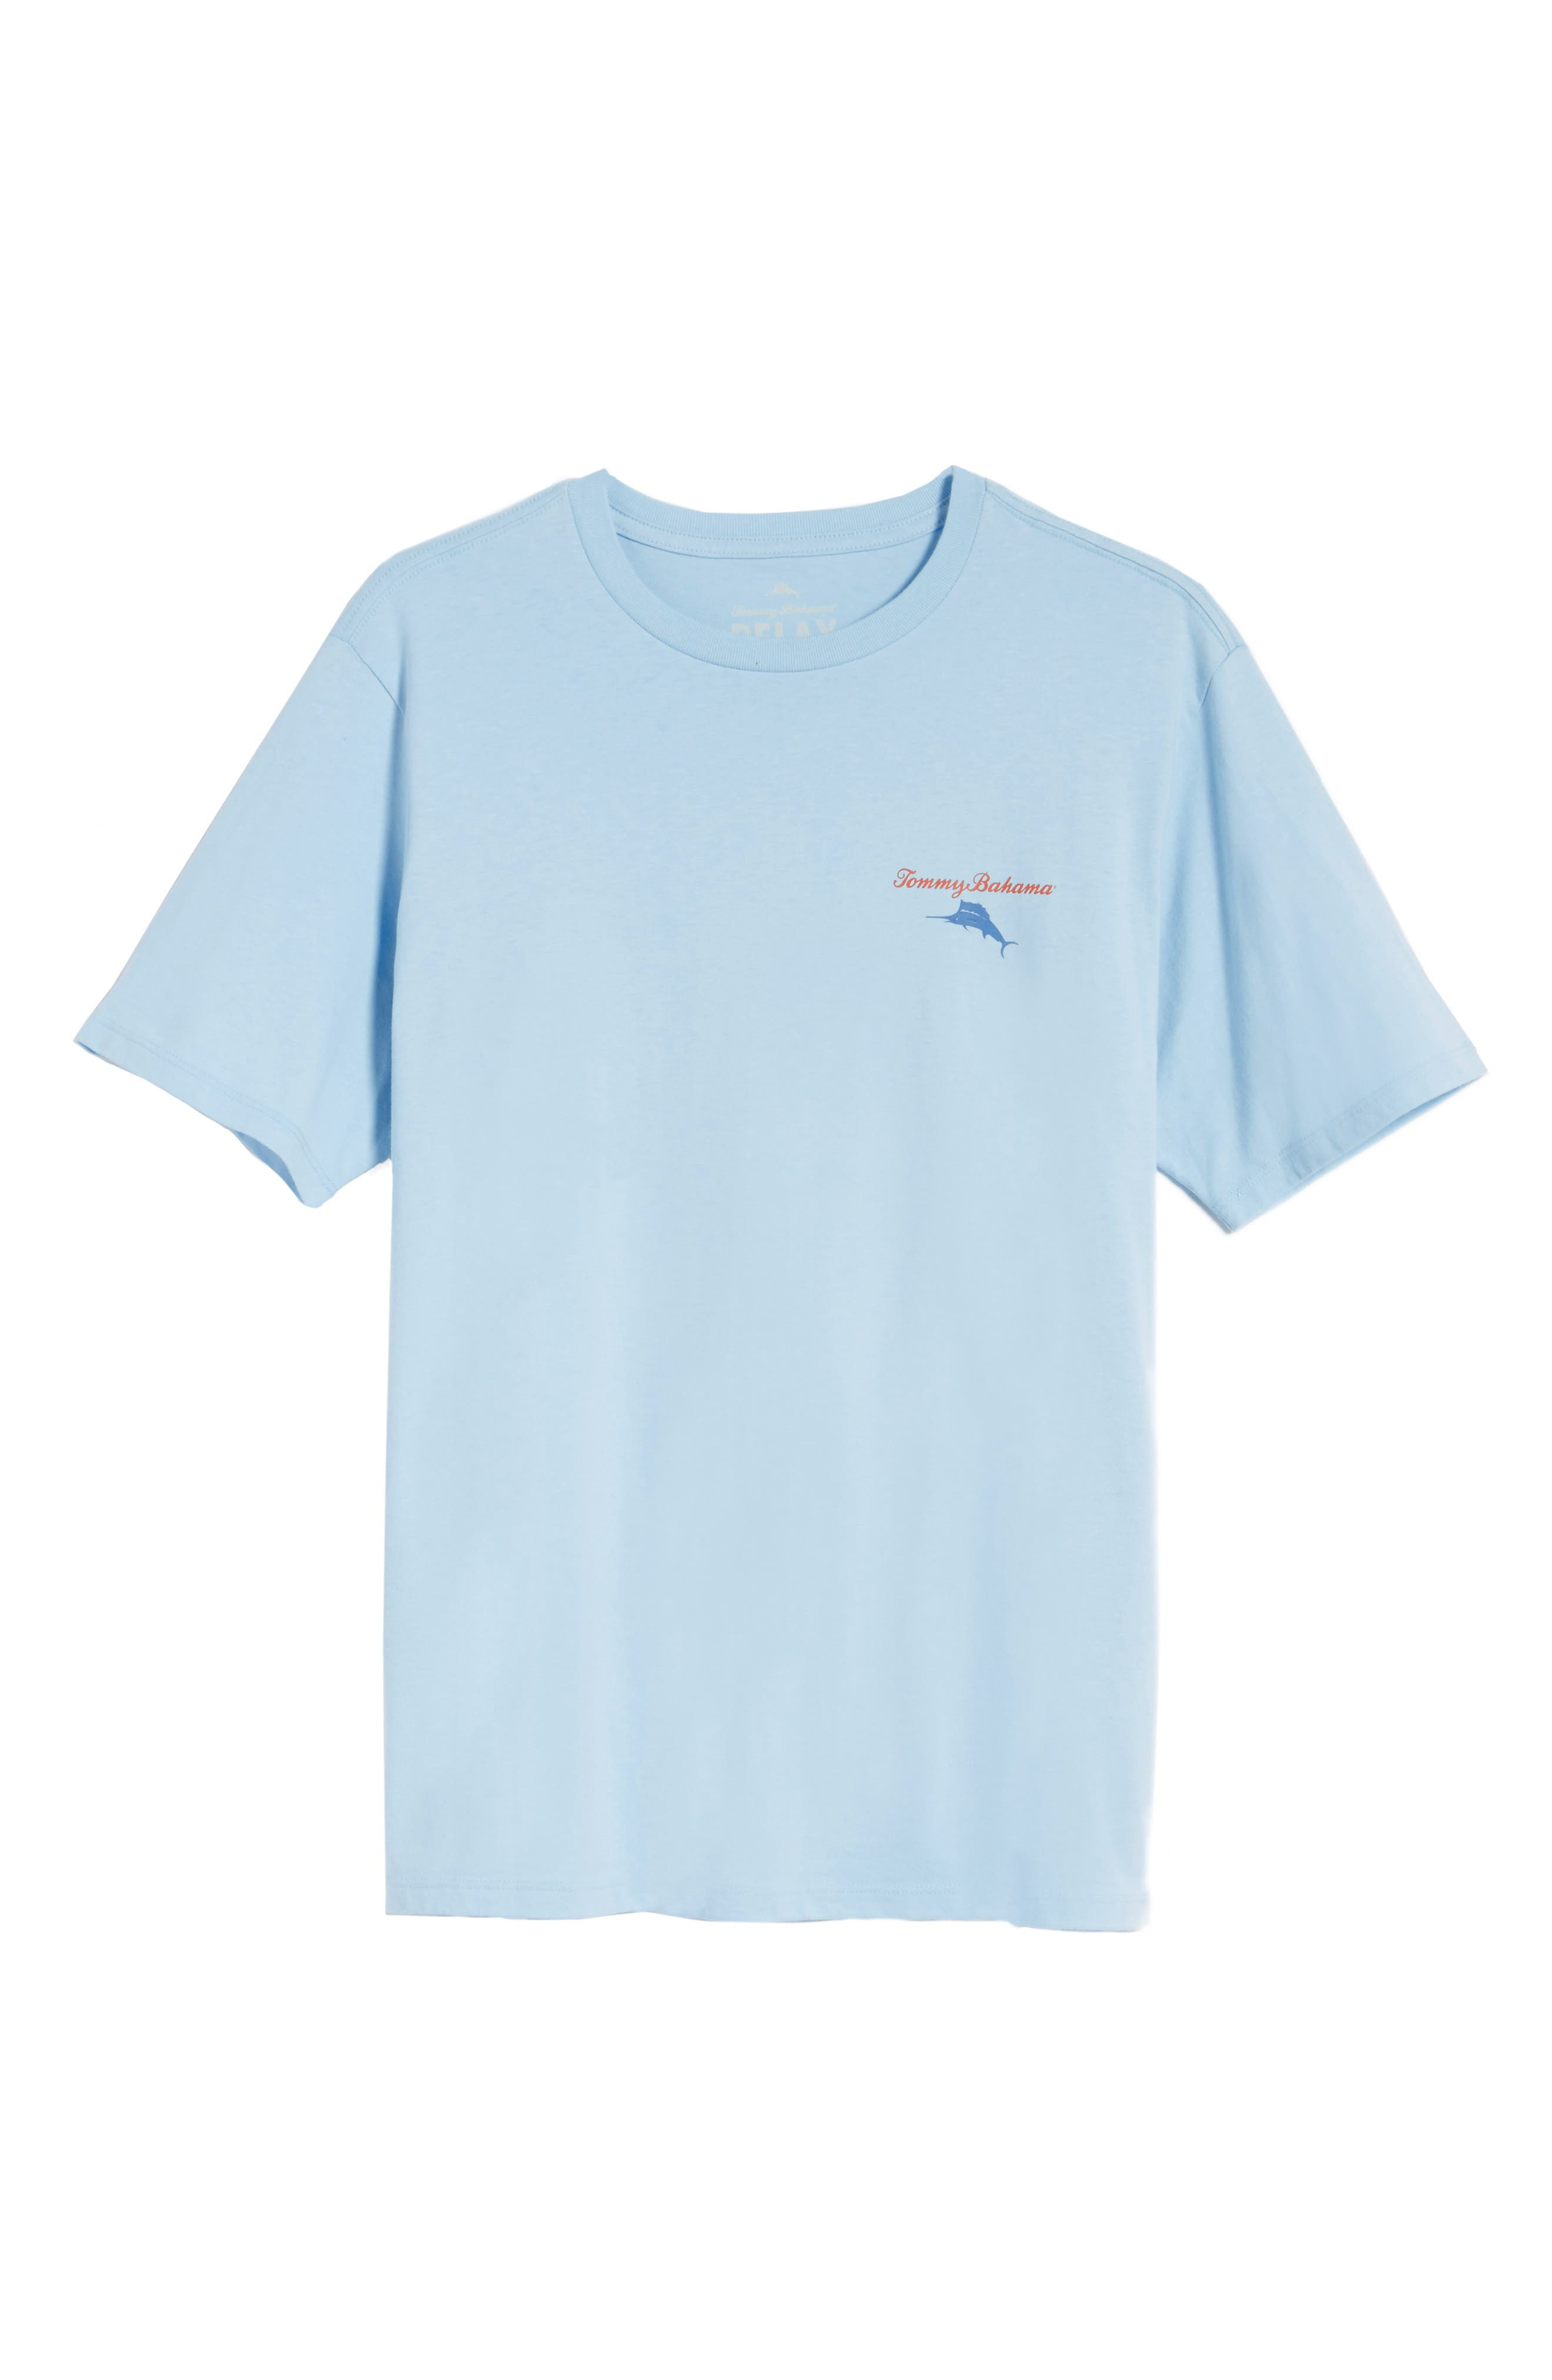 Mr. Ice Guy T-Shirt,                             Alternate thumbnail 6, color,                             Graceful Sea